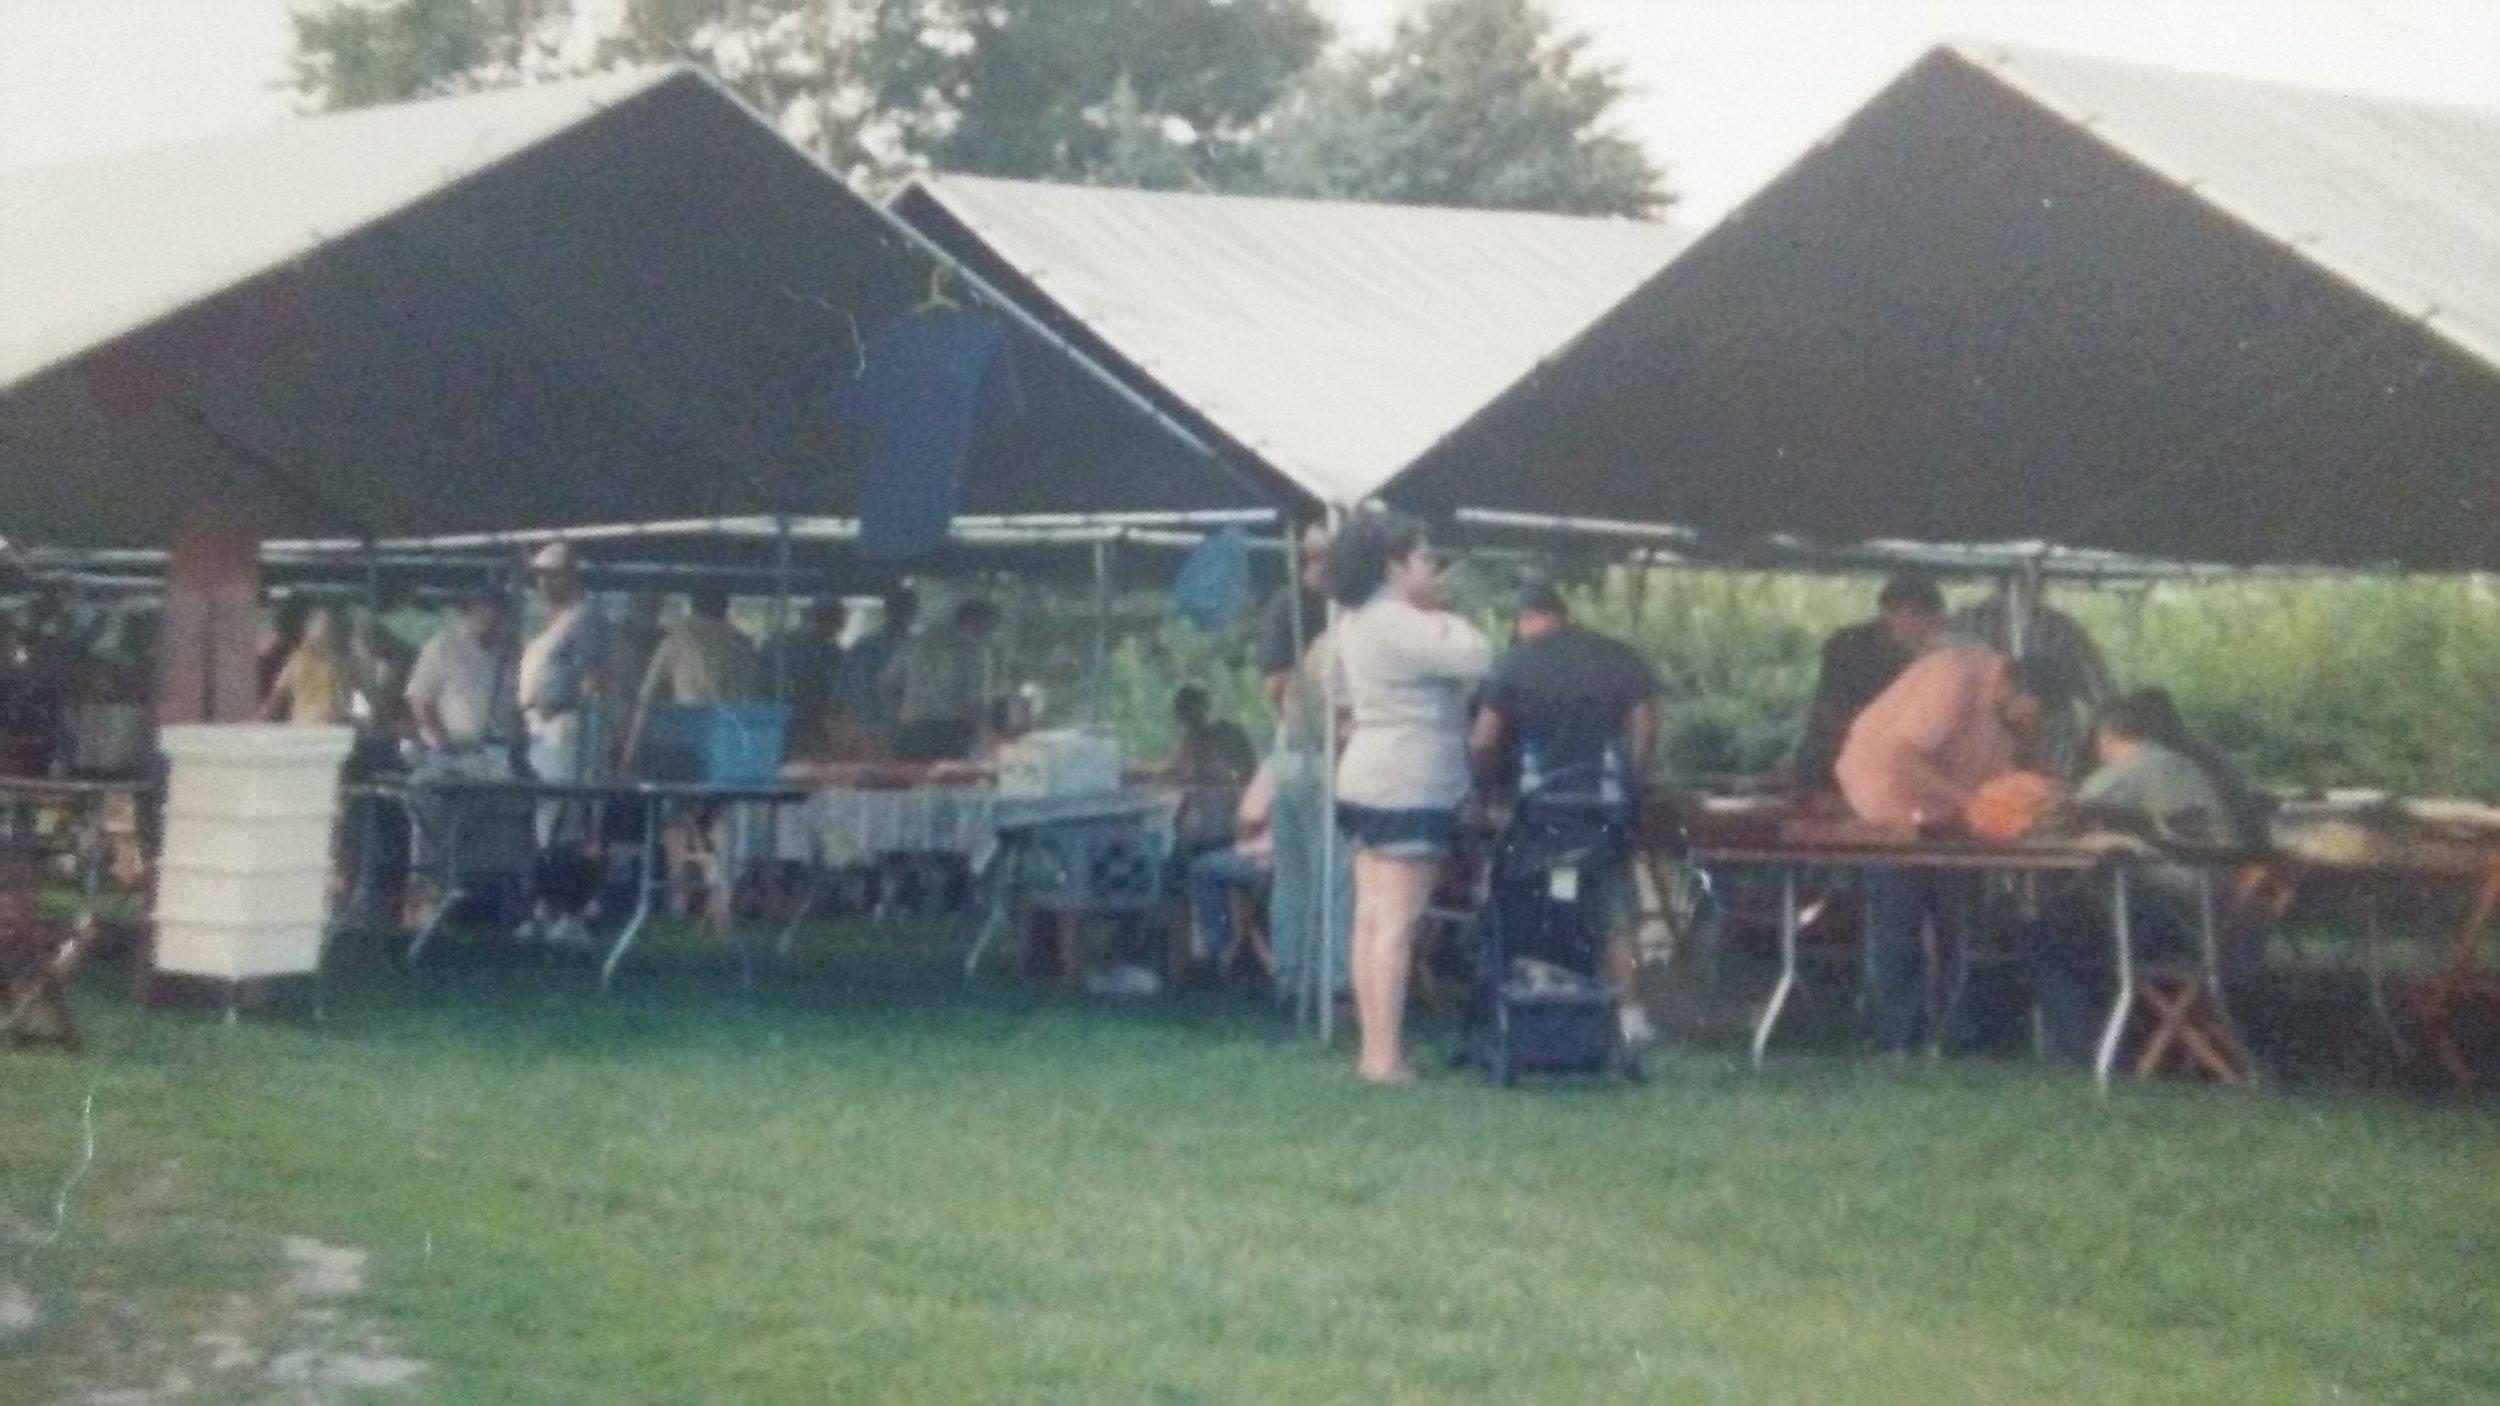 .Seaman's Fort summer picnic 2003